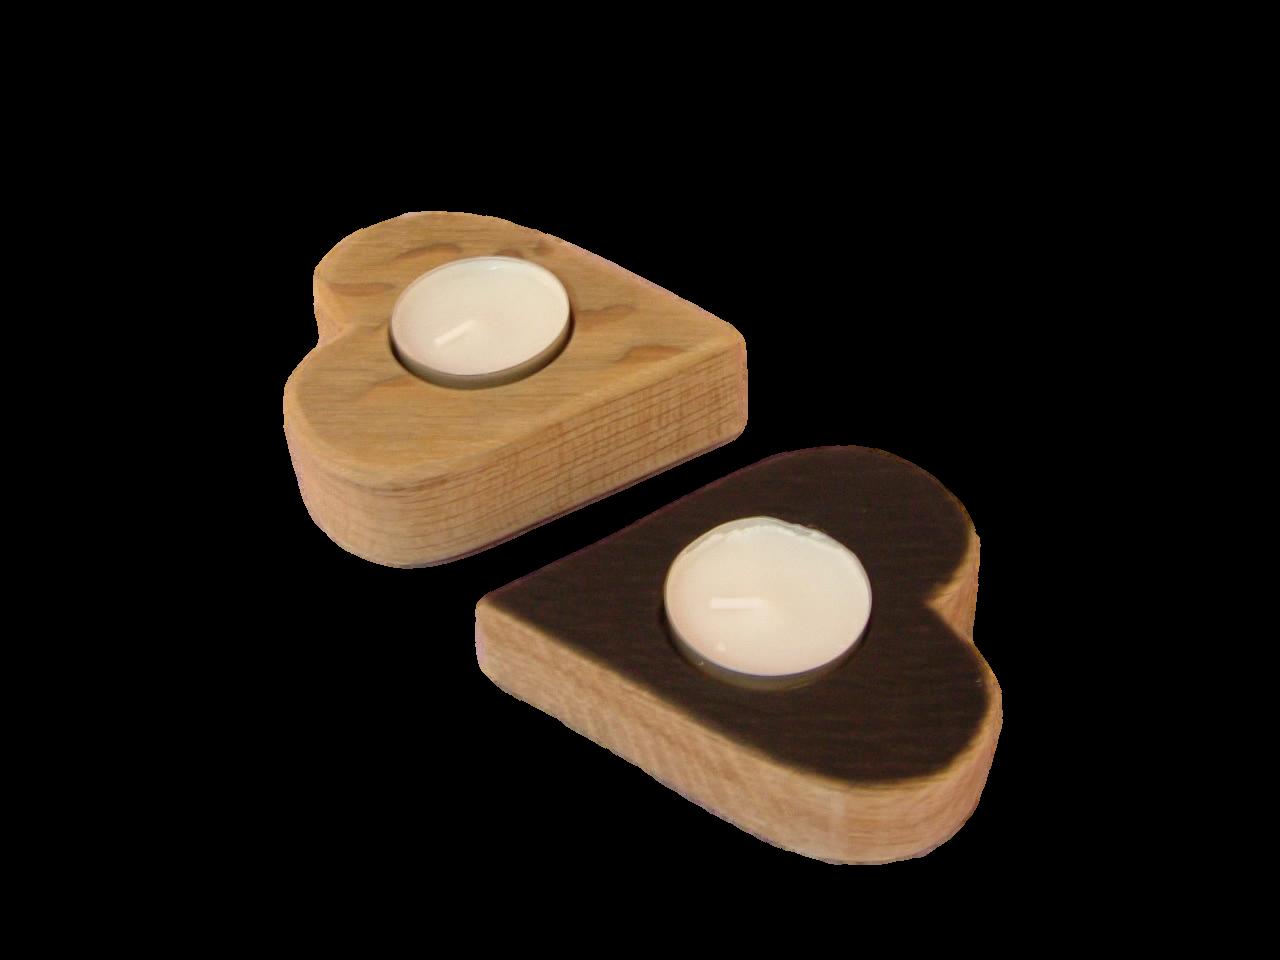 scottish oak heart shaped tealight holder